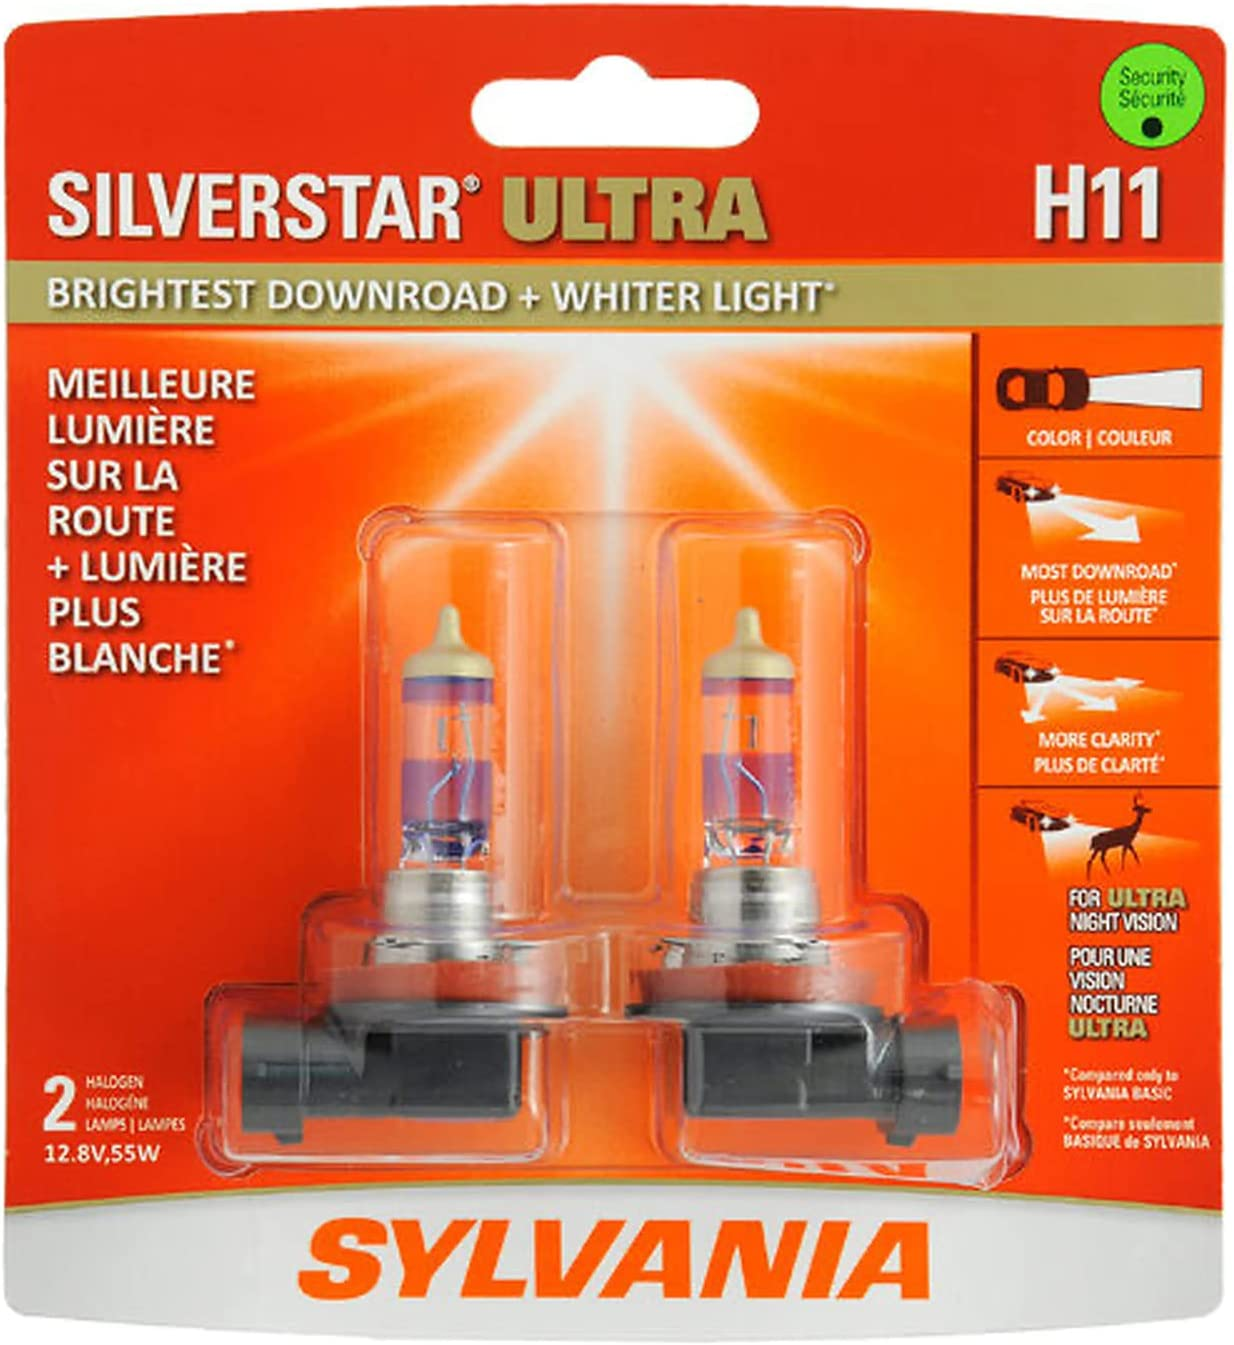 Sylvania H11 SilverStar Ultra High Performance Halogen Headlight Bulb